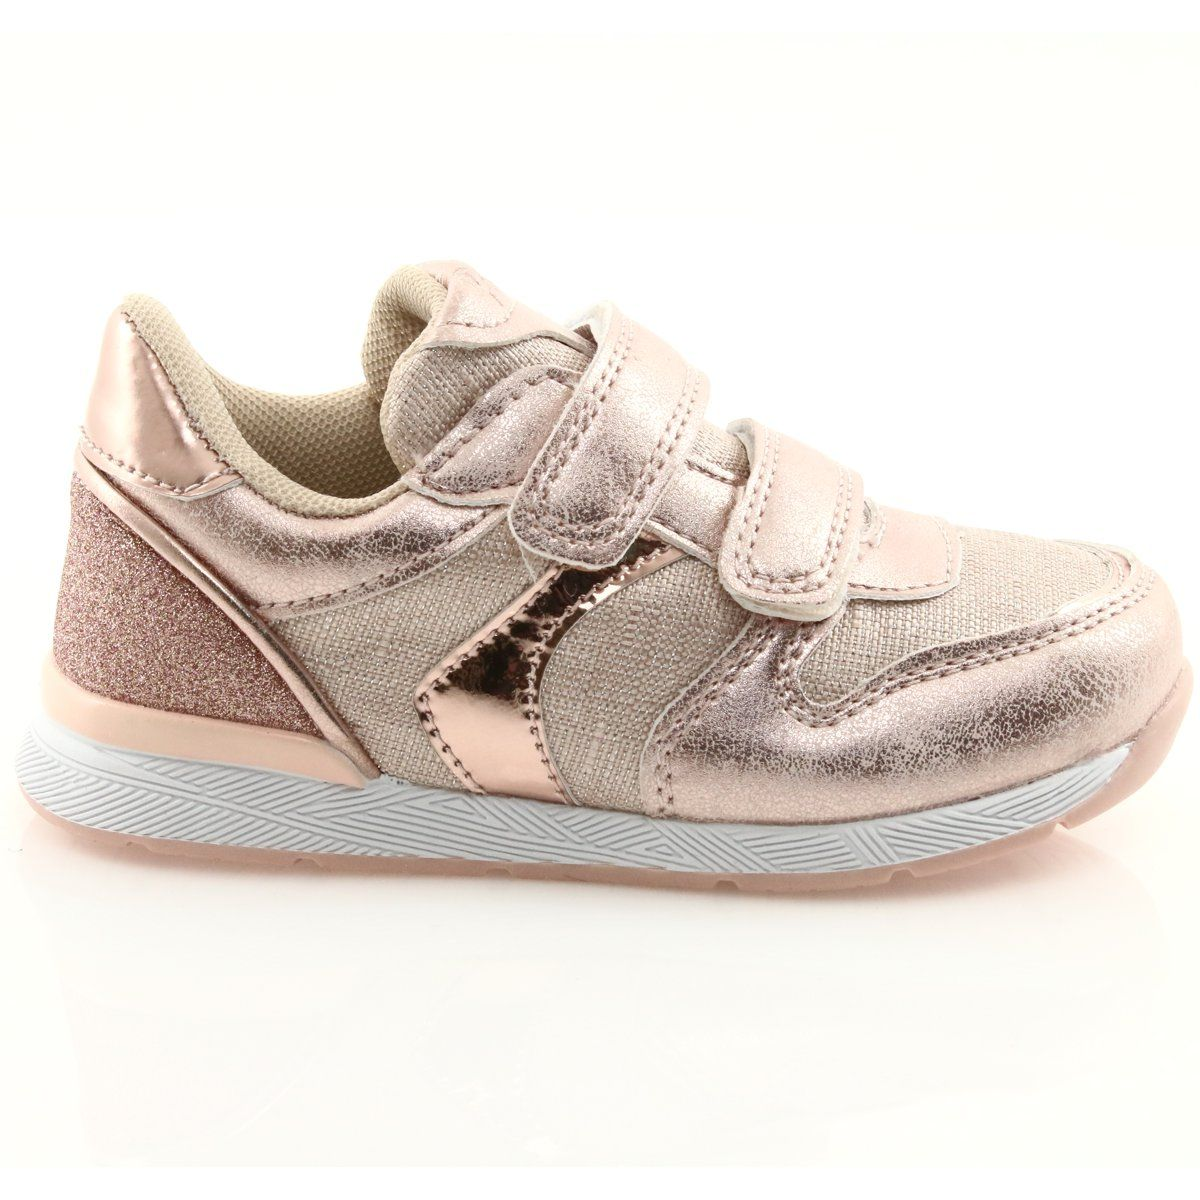 Rozowe Trampki American Club Es25 Gold Zolte Pink Sneakers Kid Shoes Sneakers